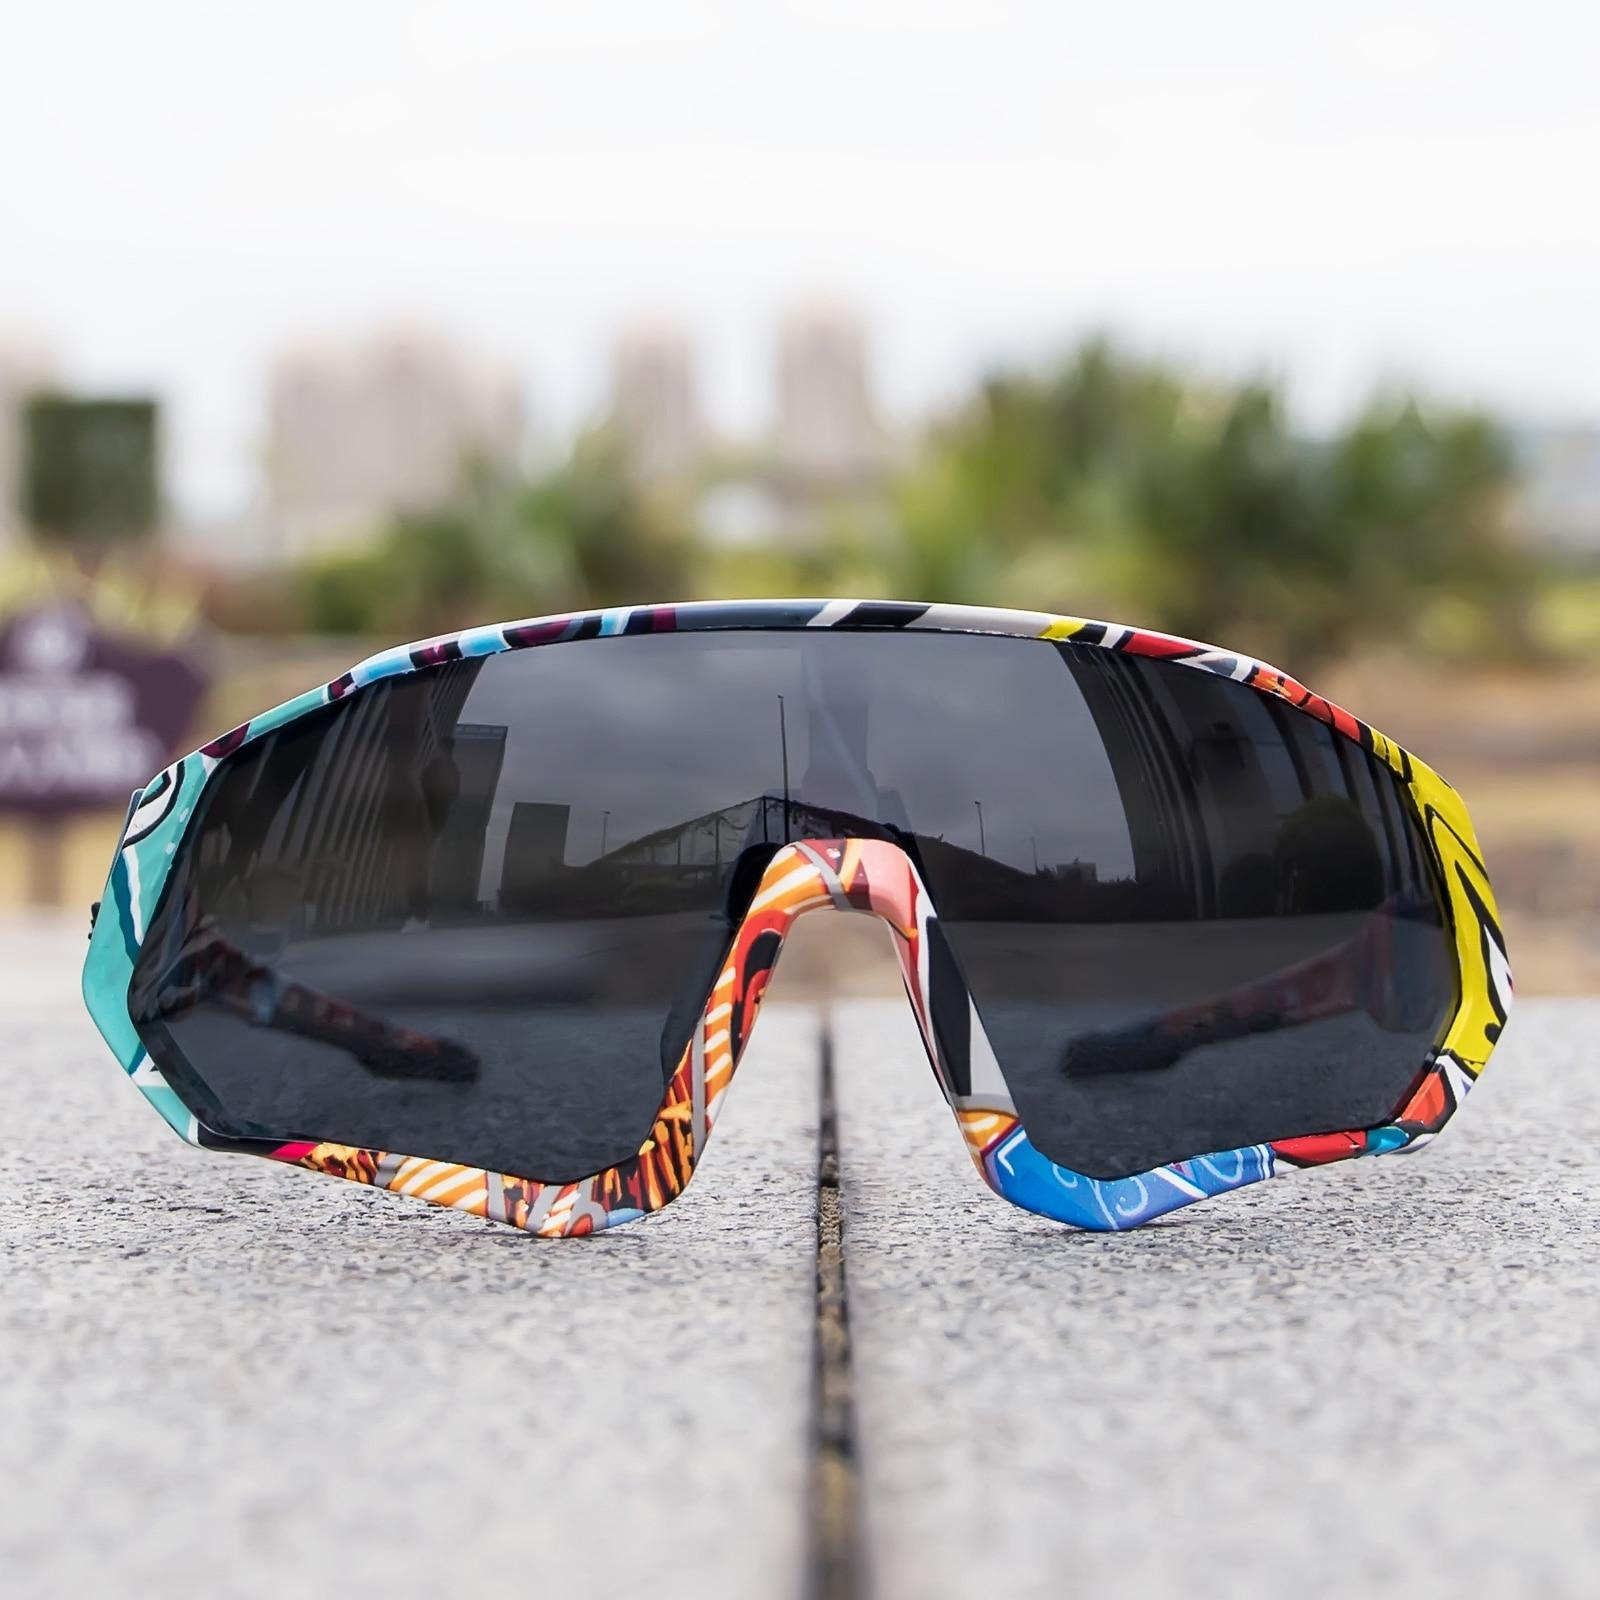 Kapvoe occhiali da ciclismo fotocromatici uomo donna Sport strada Mtb Mountain Bike occhiali da bicicletta occhiali da ciclismo occhiali occhiali 2